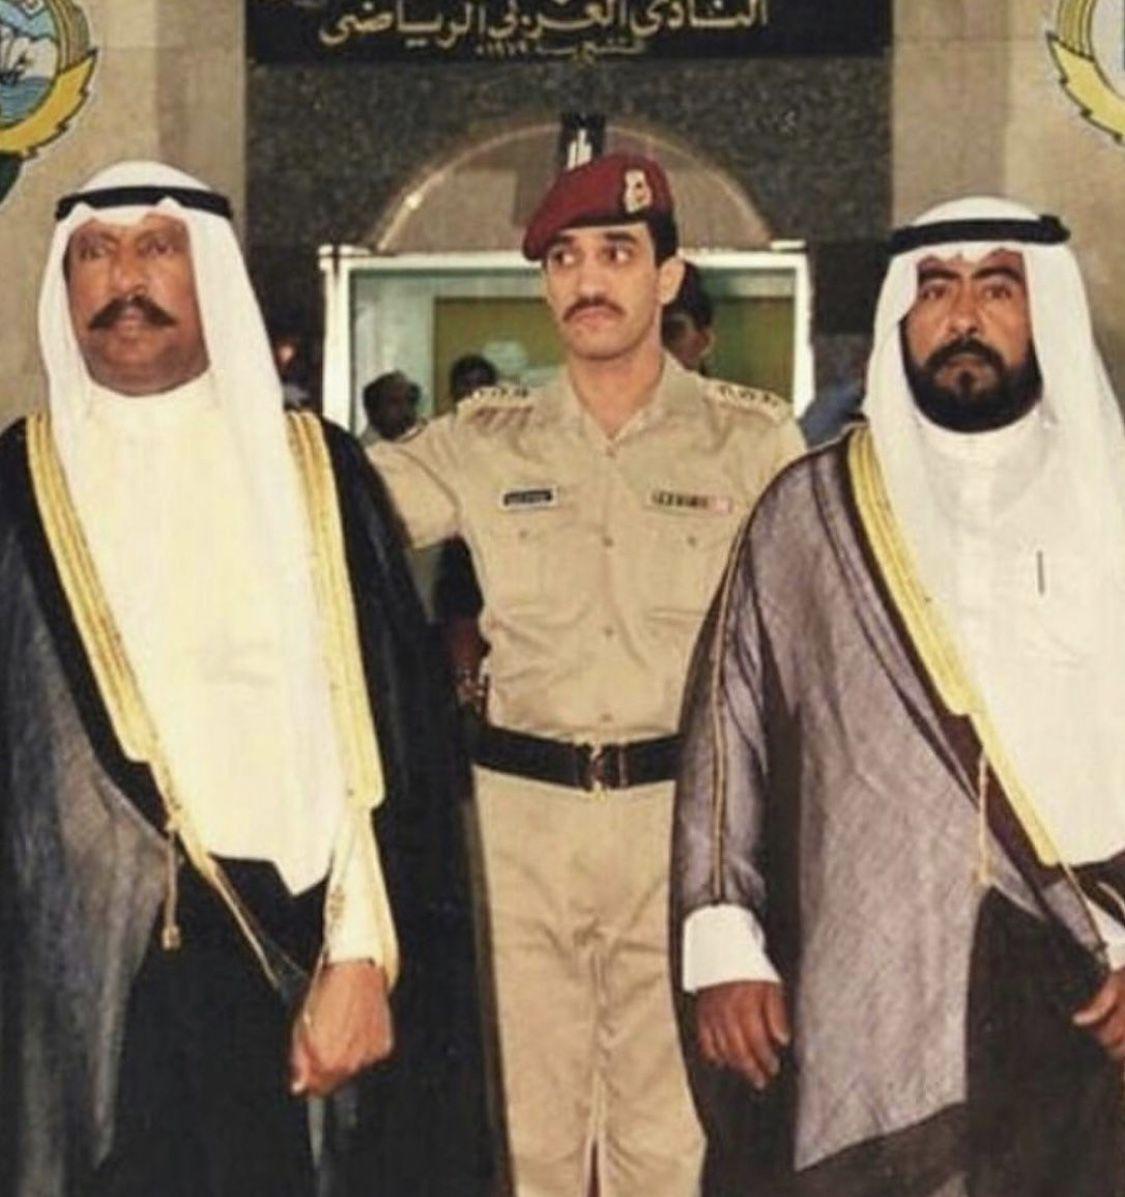 Sheikh Saad Al Abdullah Al Sabah Sheikh Fahd Al Yousef Al Sabah Sheikh Fahd Al Ahmad Al Sabah In 2020 Kuwait Nun Dress Fashion